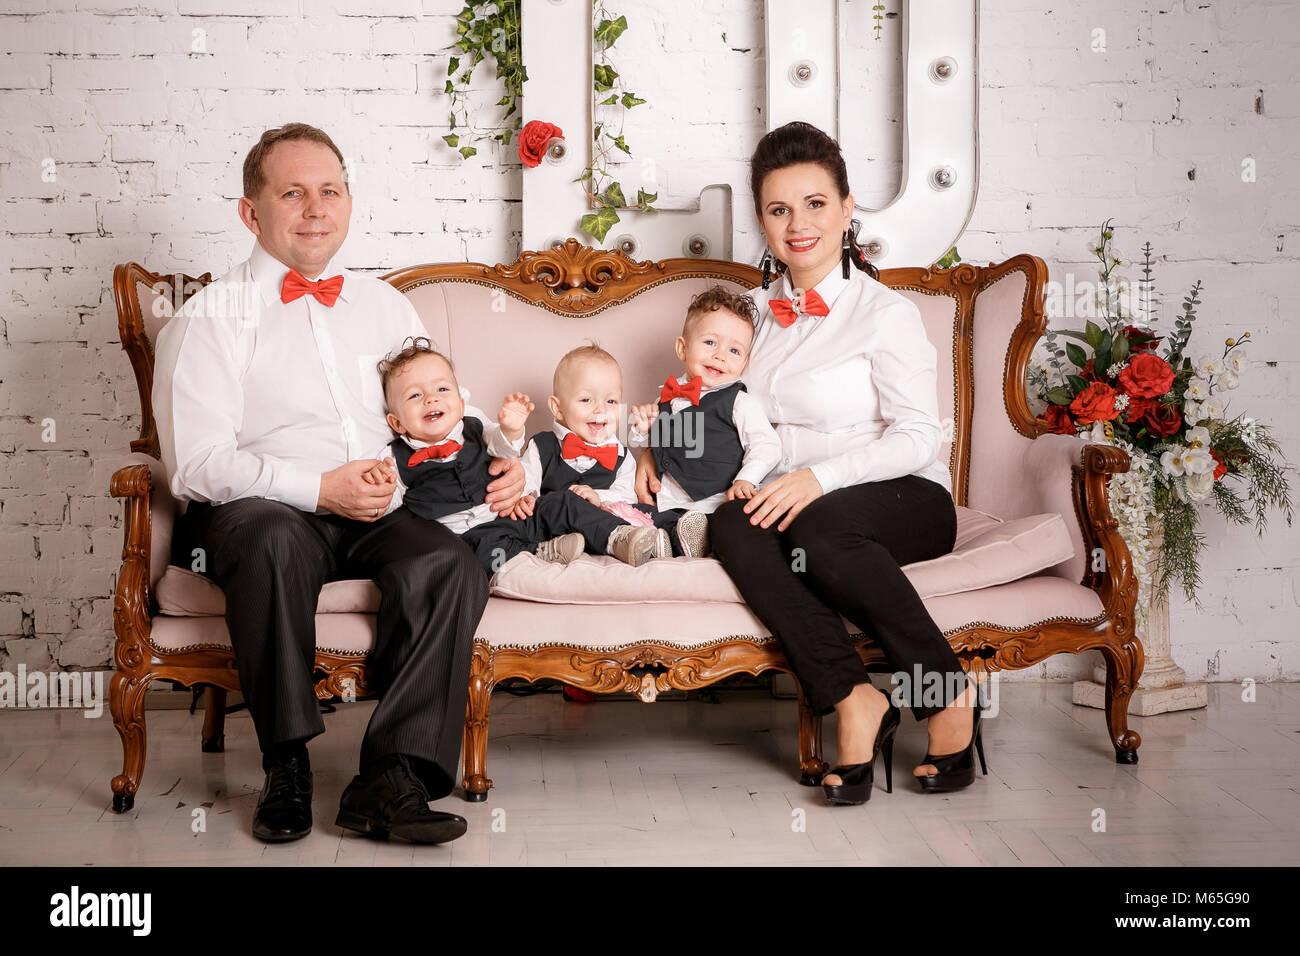 Familia feliz: padre, madre, hijos trillizos Imagen De Stock